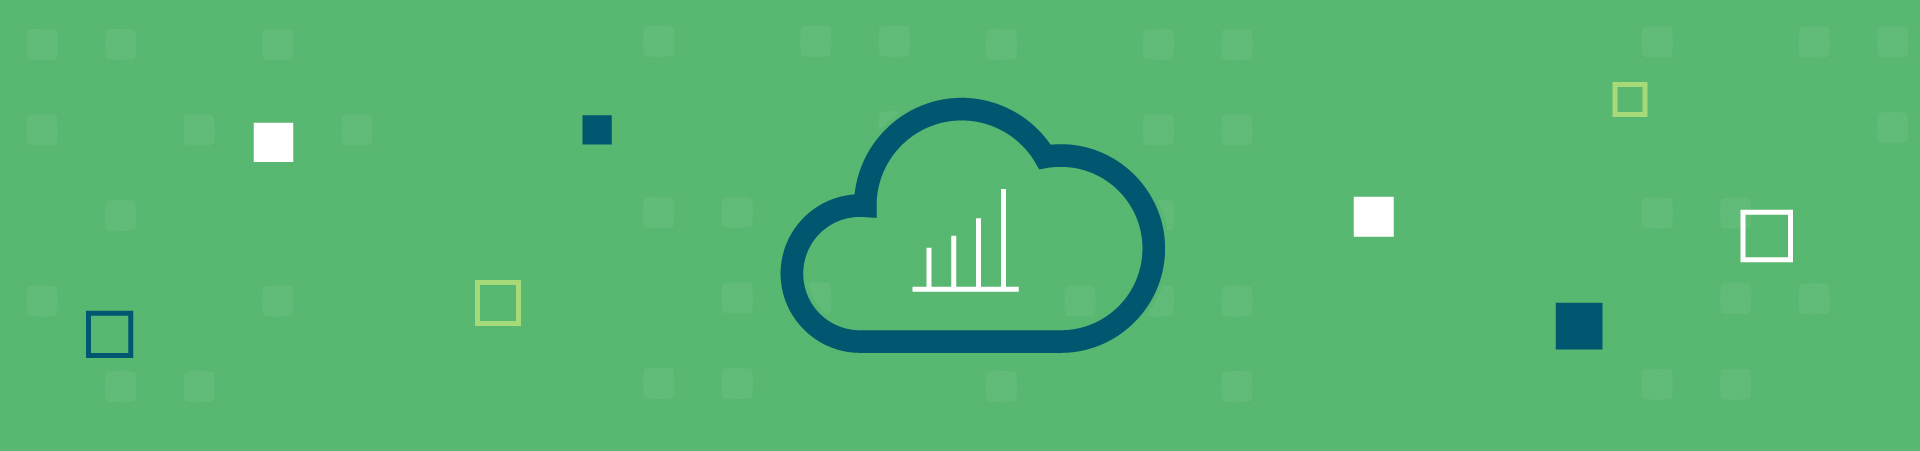 cloud-analytics-data_wide-illustration